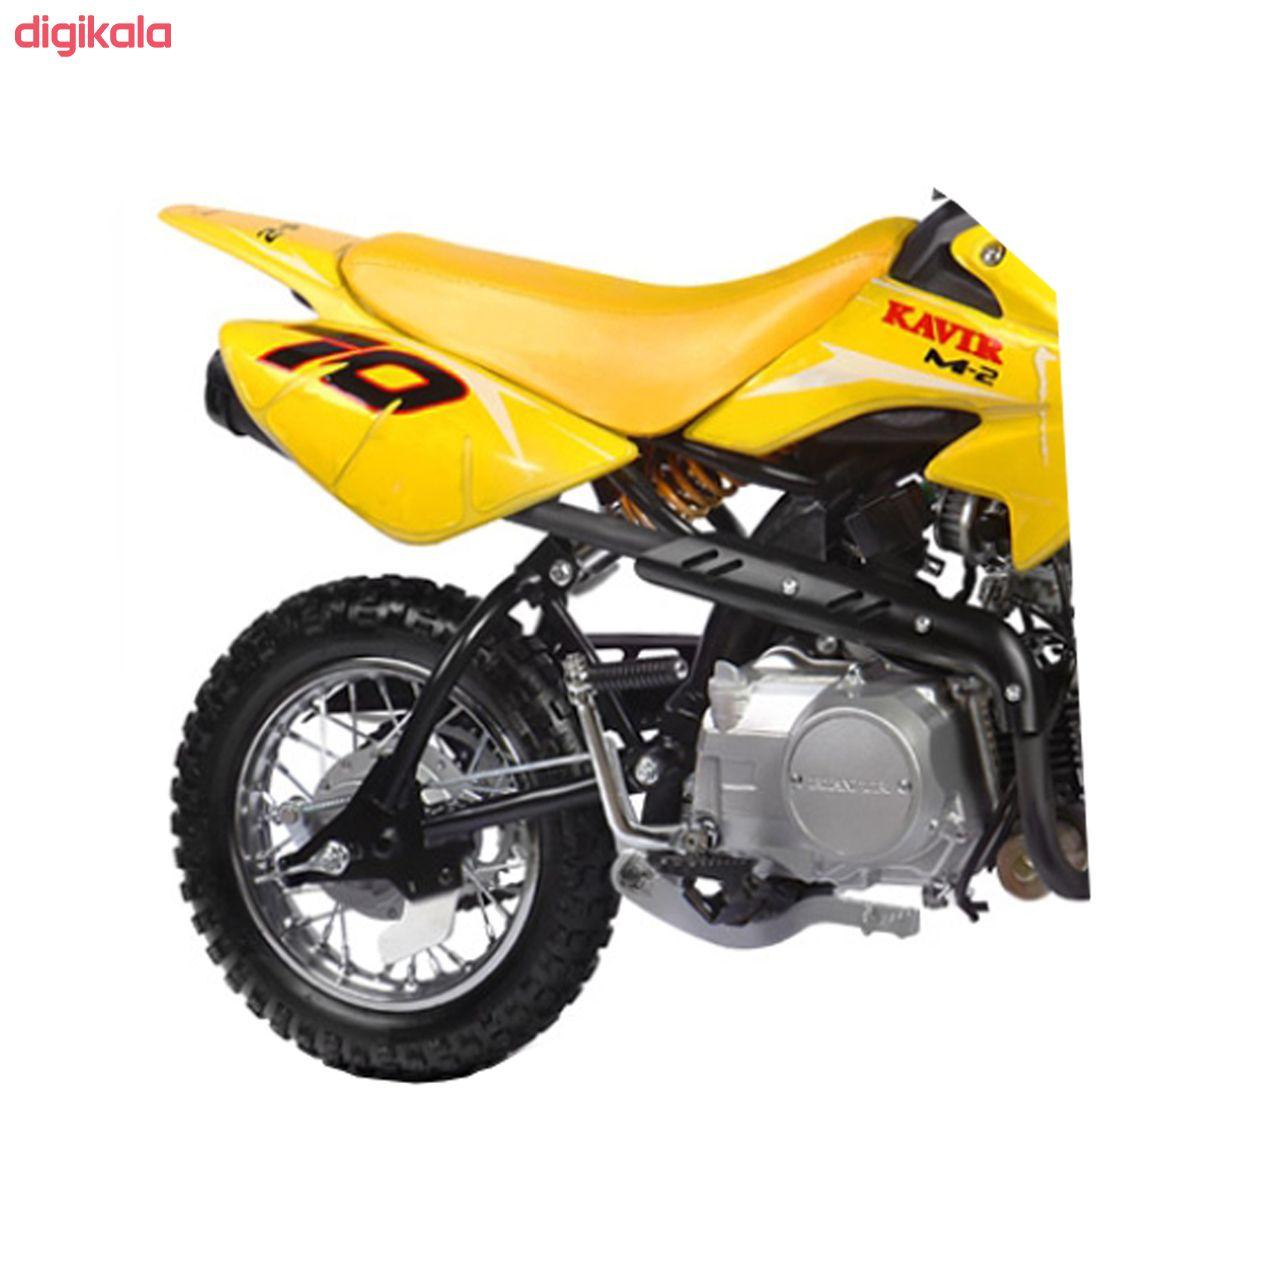 موتورسیکلت کویر مدل مینی  70MT2 سی سی سال 1399 main 1 3